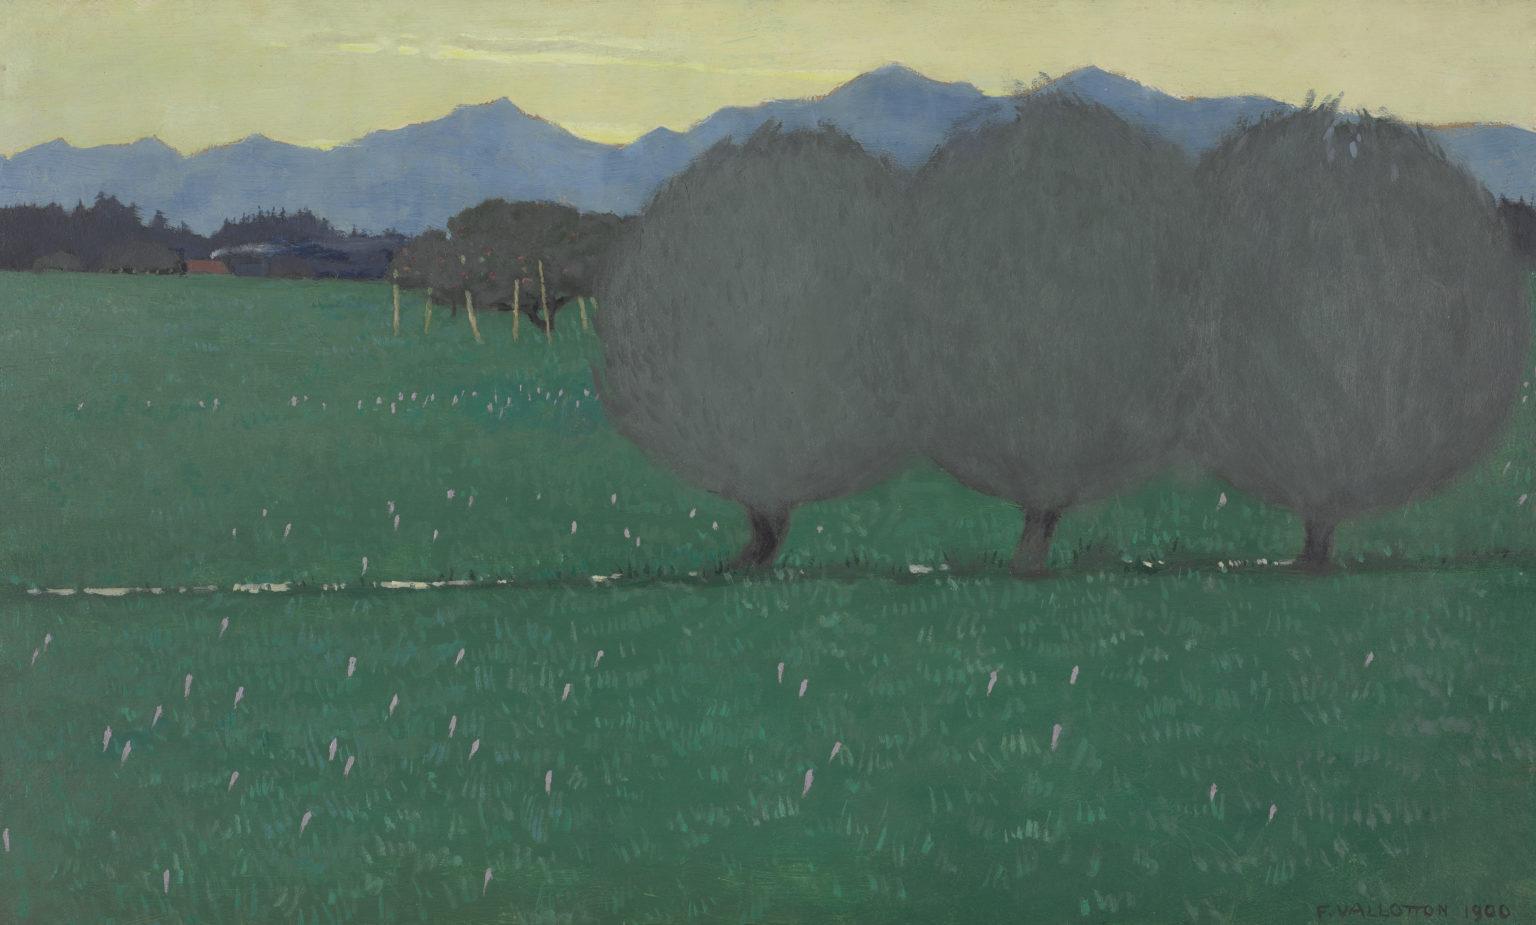 Les saules, 1900, huile sur carton, Félix Vallotton